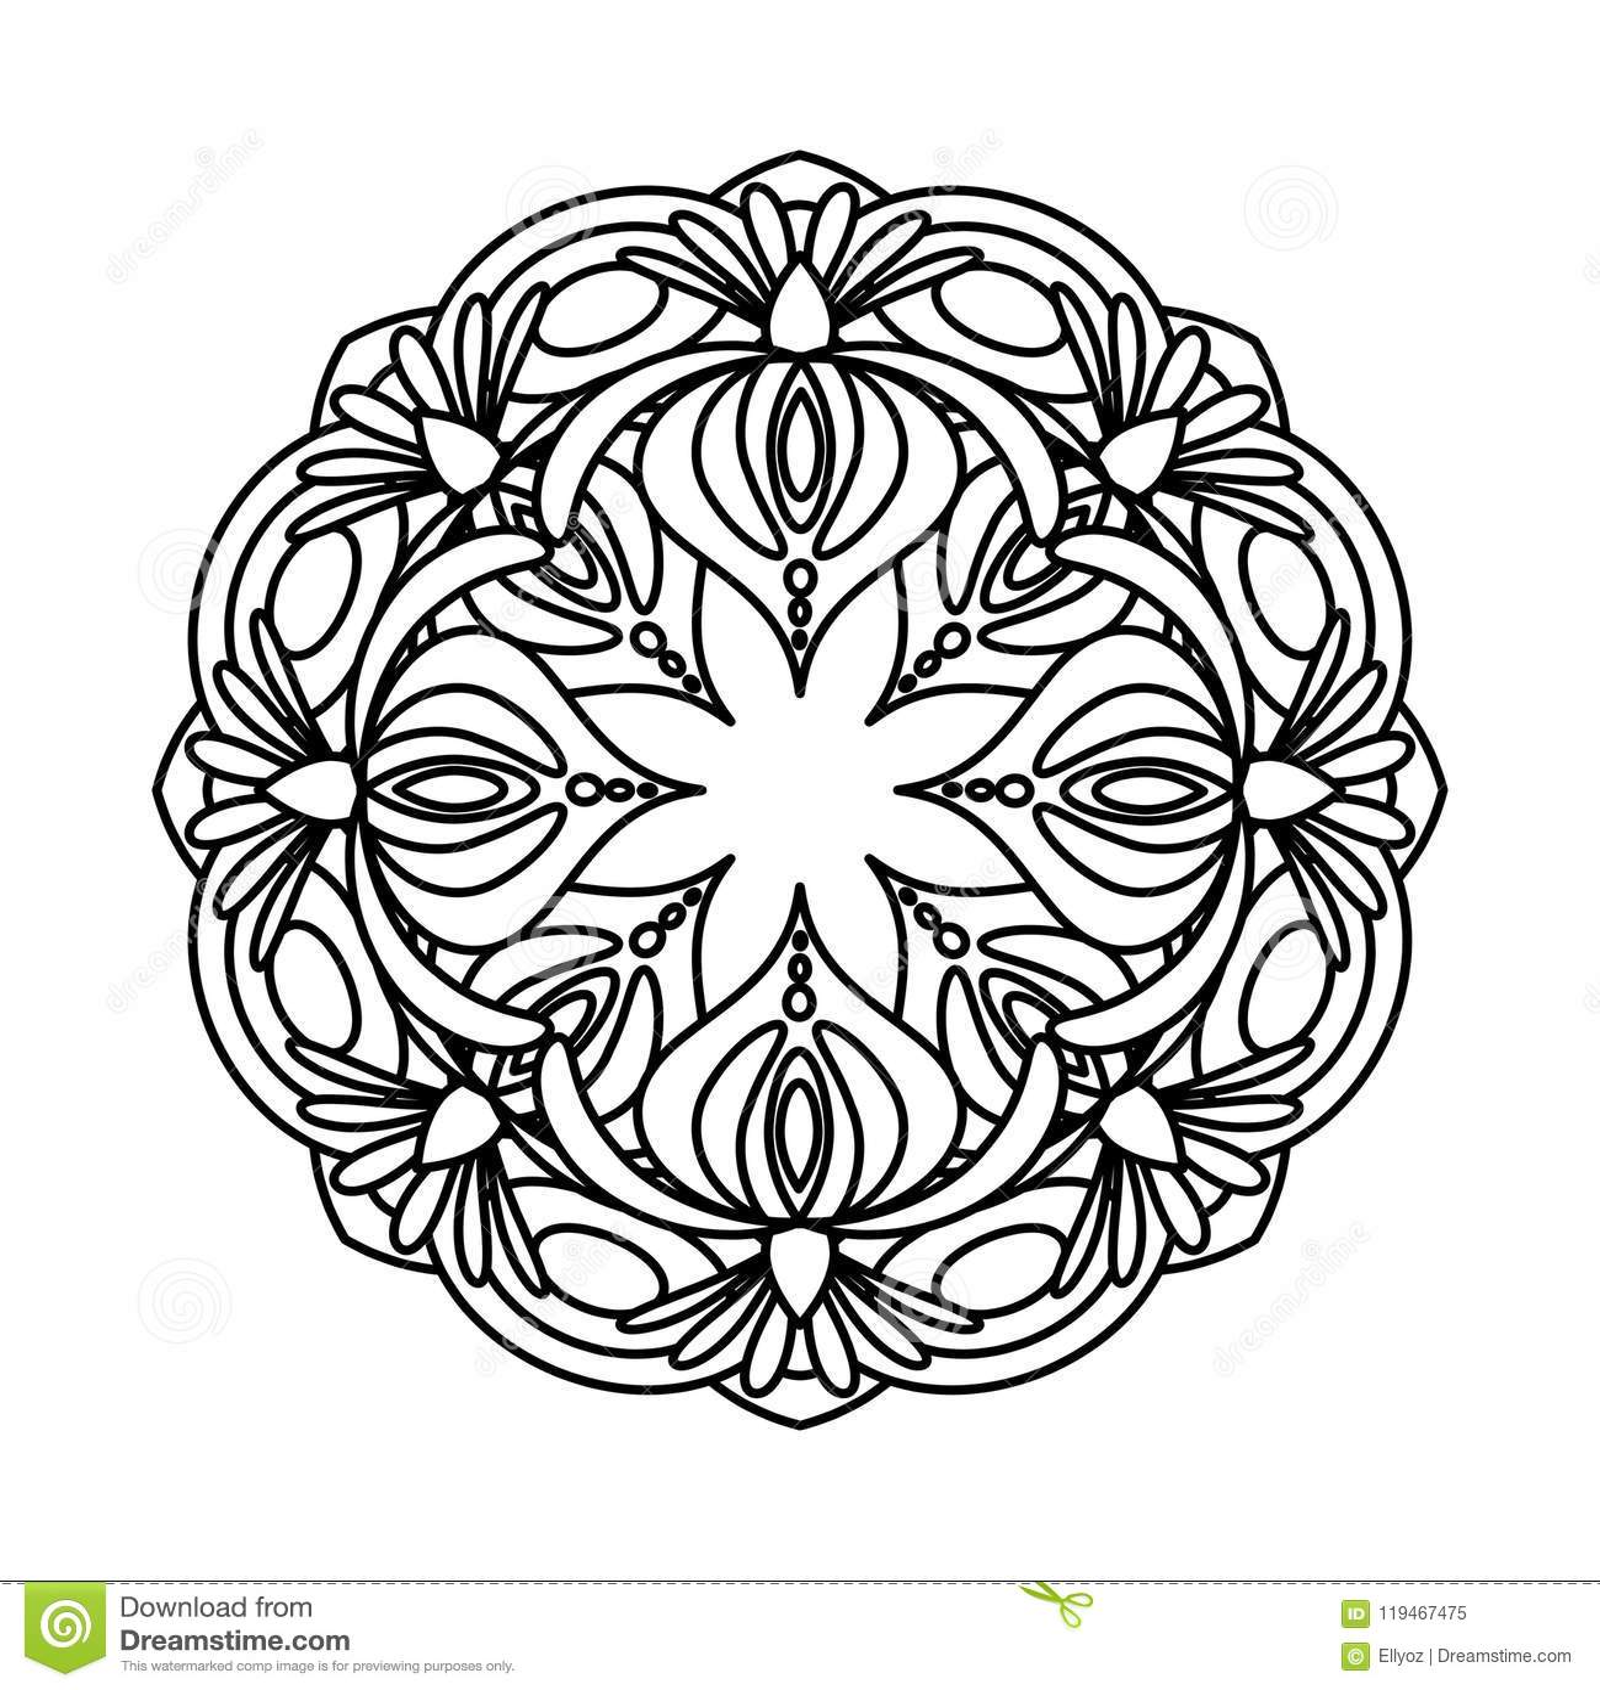 Flower Mandala Vector Illustration Stock Vector - Illustration of ...